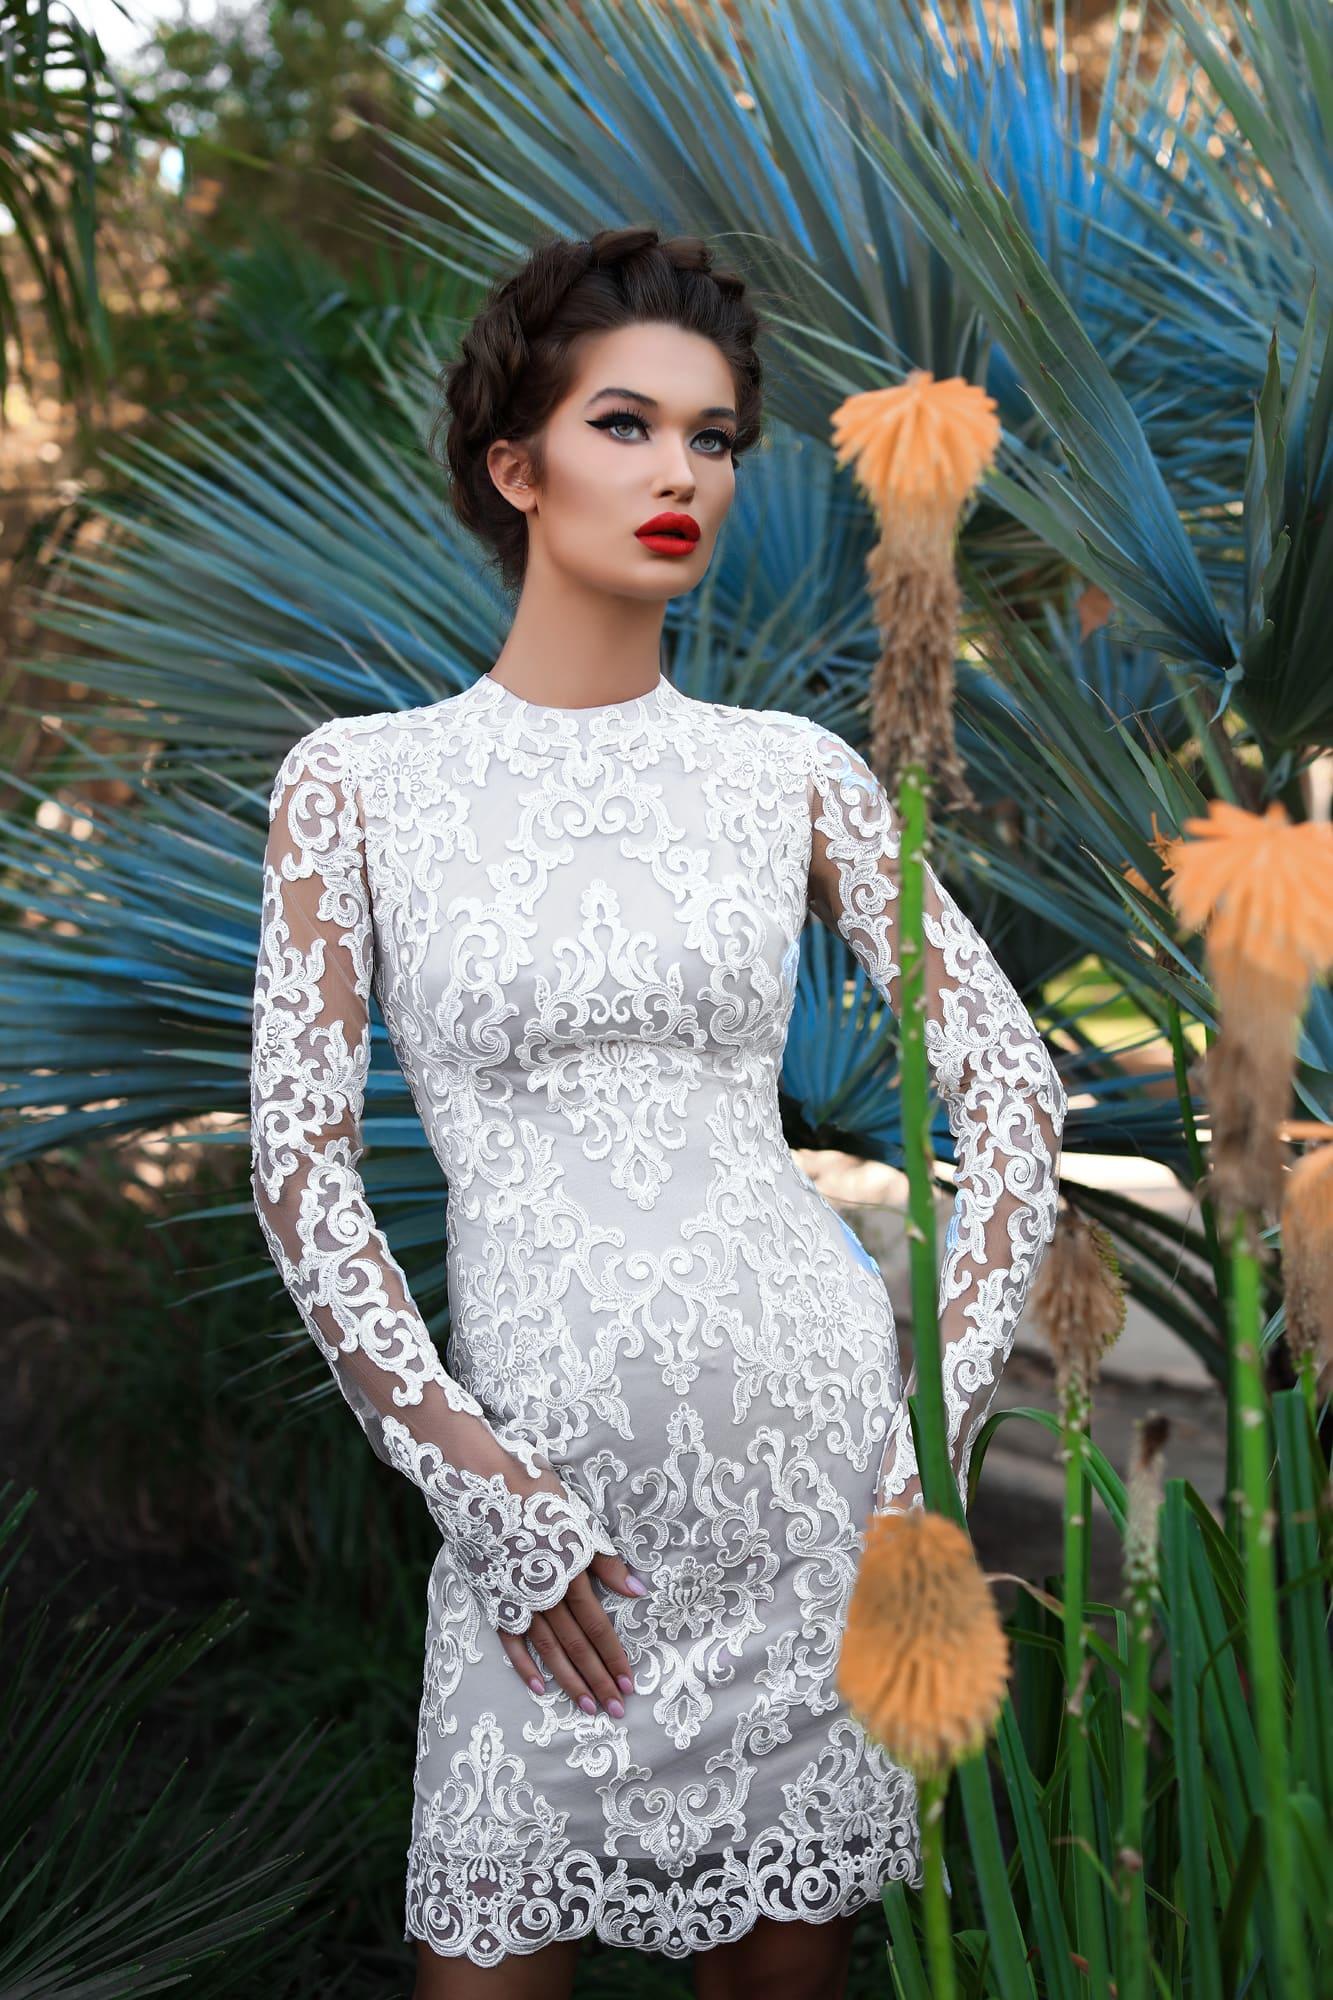 304c954f5f7 Короткое платье с длинным рукавом из кружева Victoria Soprano Chloe ...